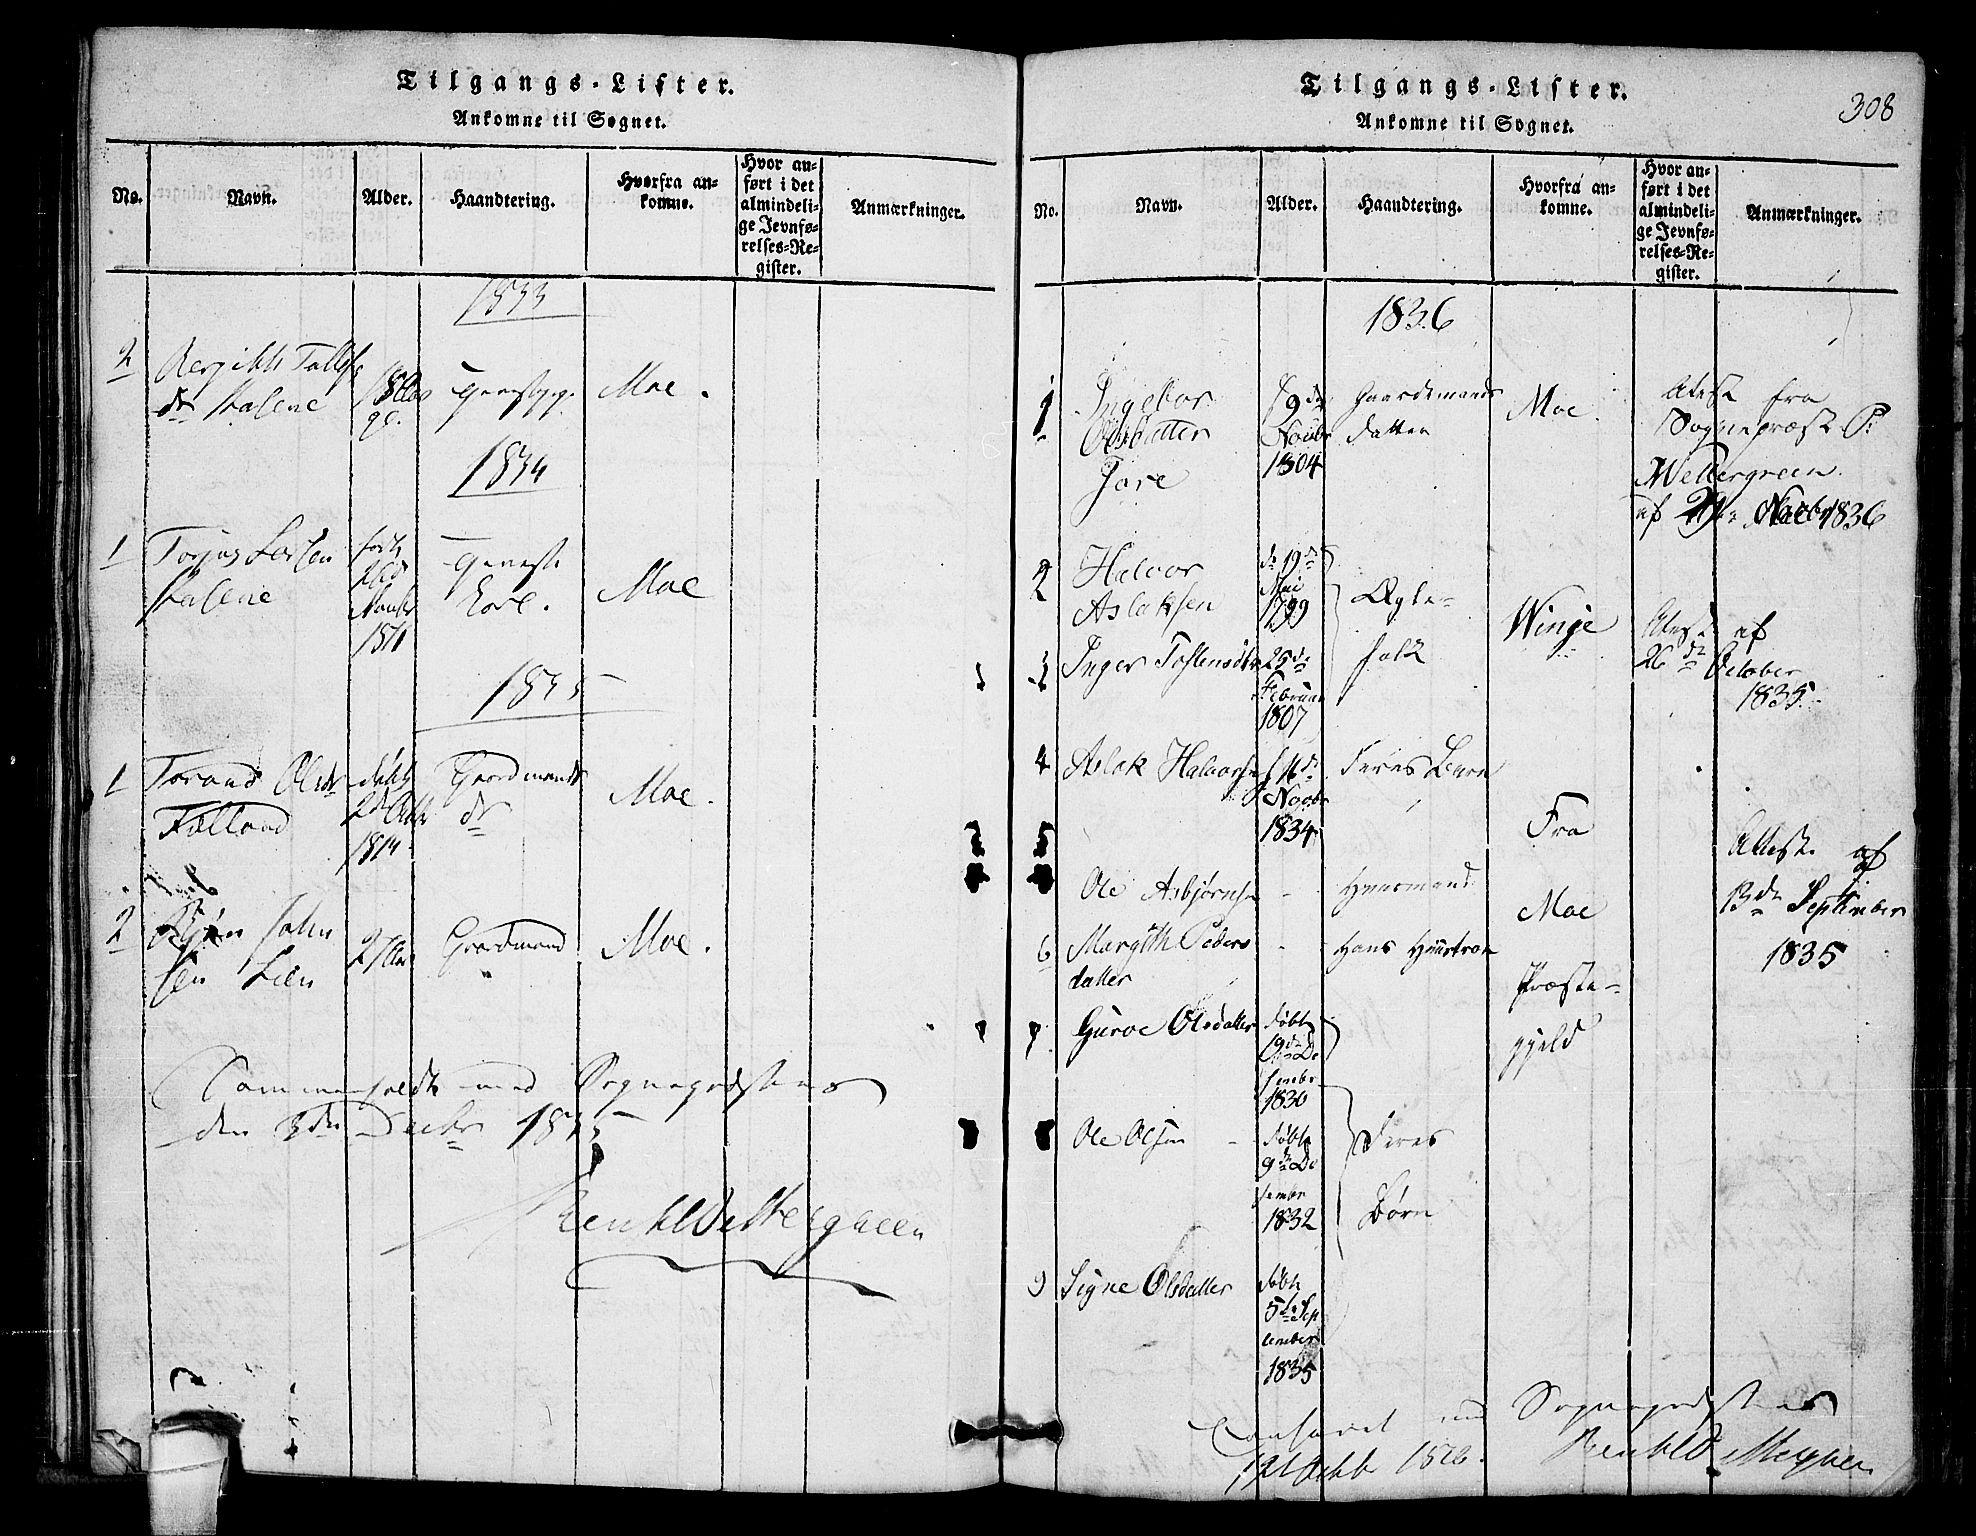 SAKO, Lårdal kirkebøker, G/Gb/L0001: Klokkerbok nr. II 1, 1815-1865, s. 308